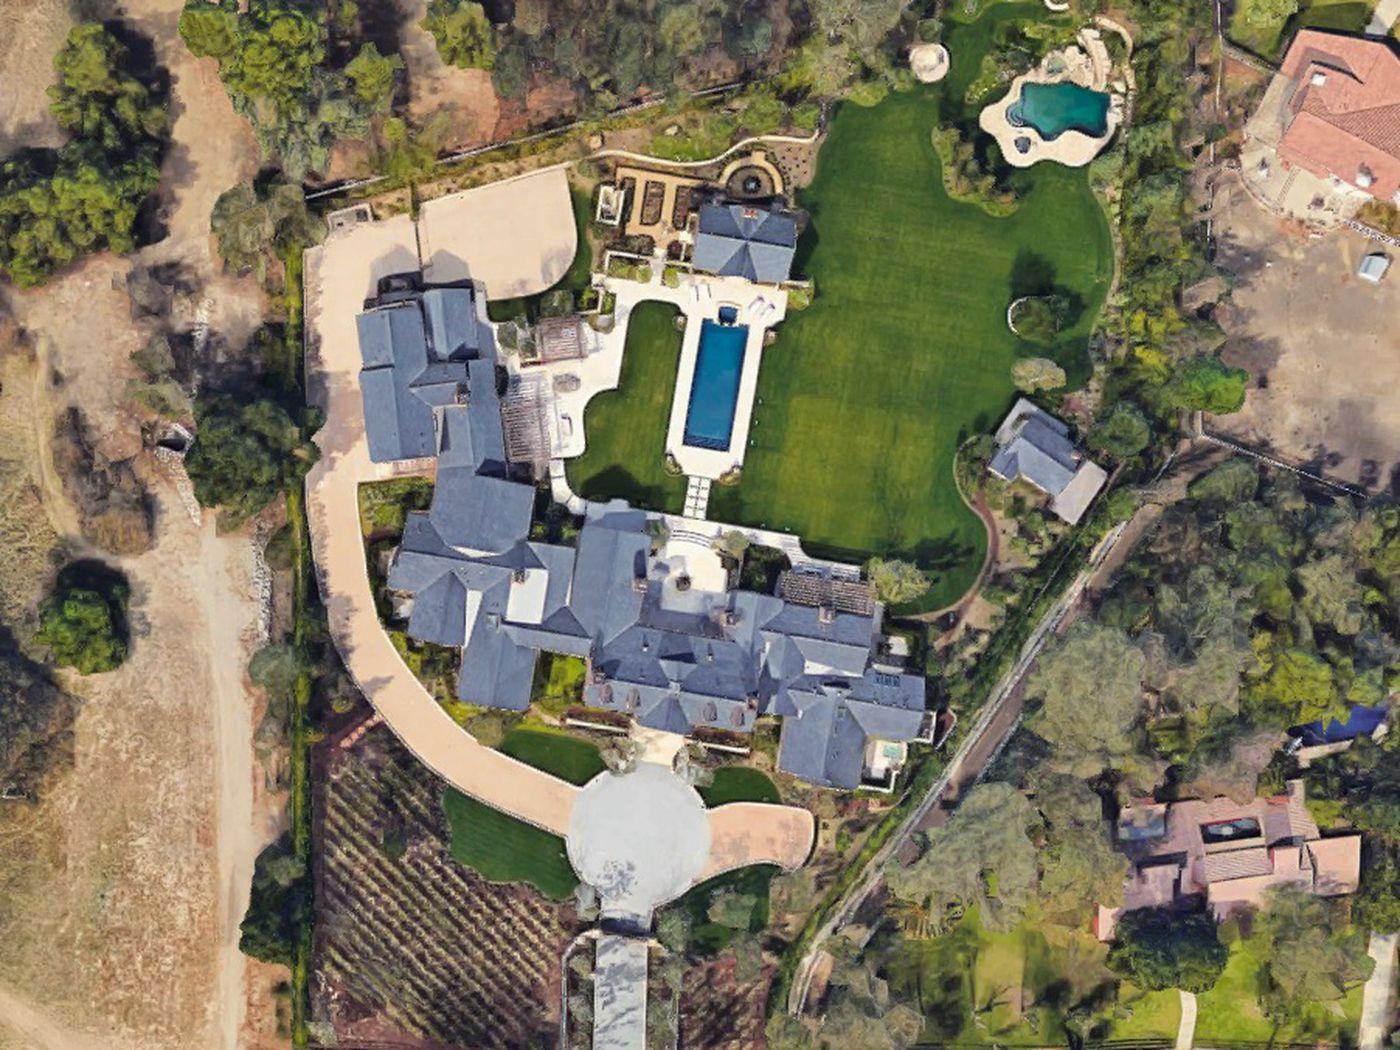 Kim Kardashian and Kanye West spent $20M renovating Hidden Hills house -  Curbed LA